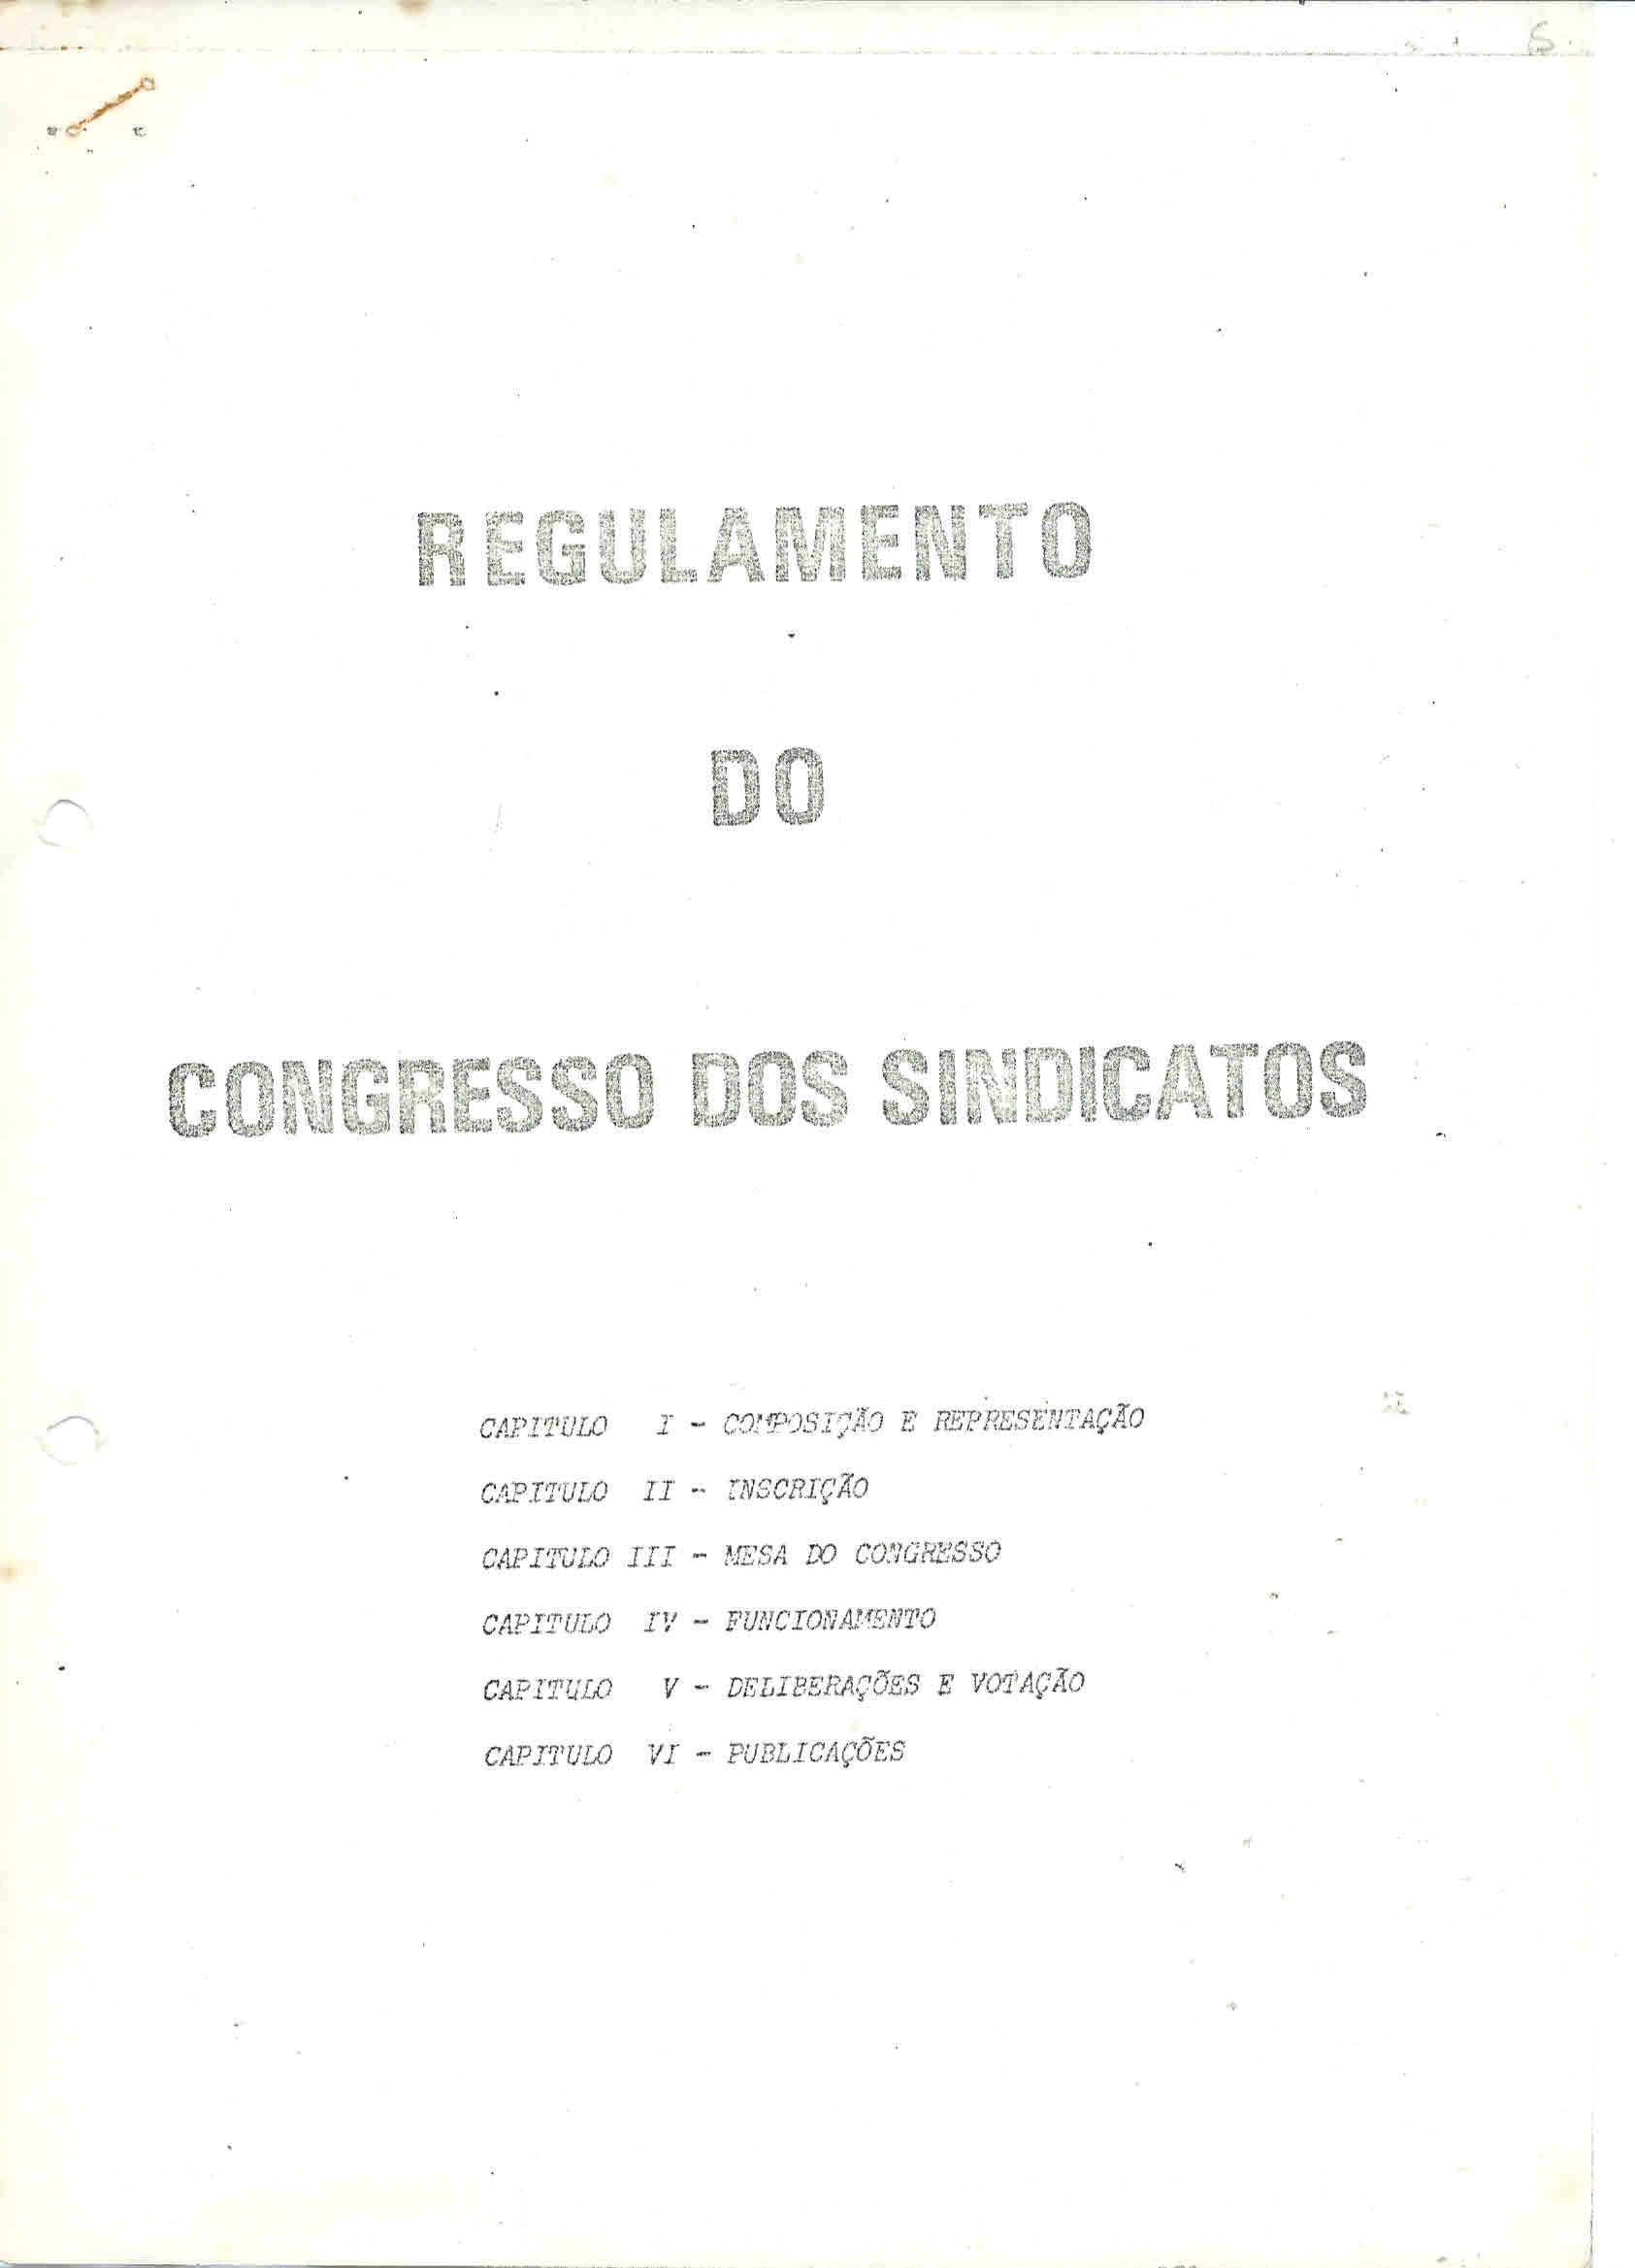 Copy of intersindical regulamento